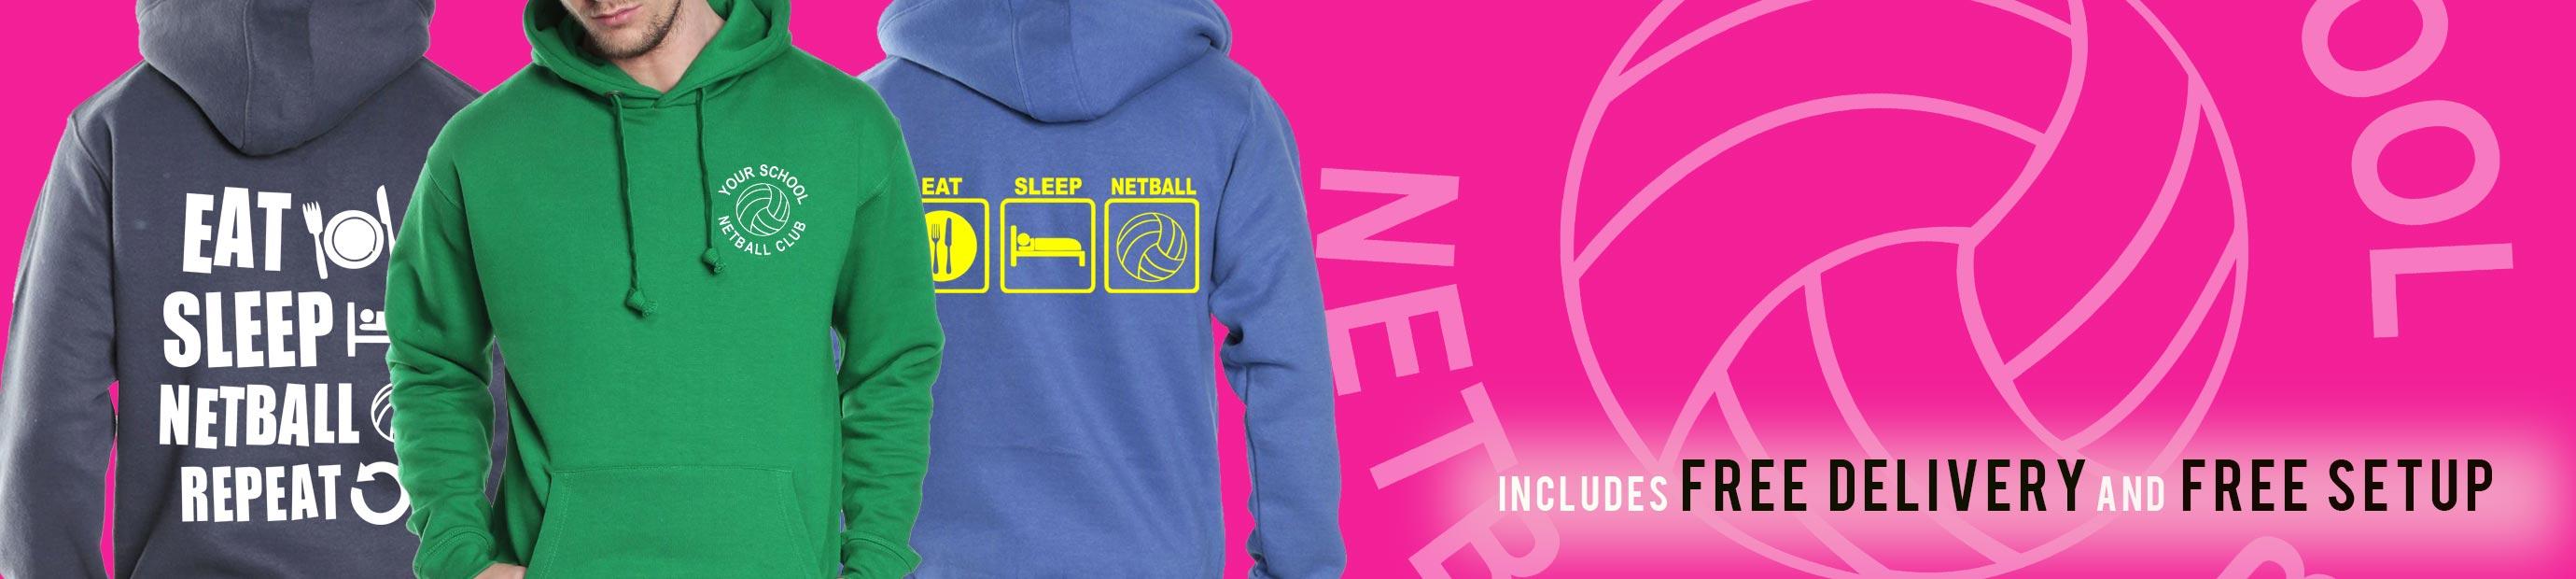 Netball Trip Hoodies from Superlogo